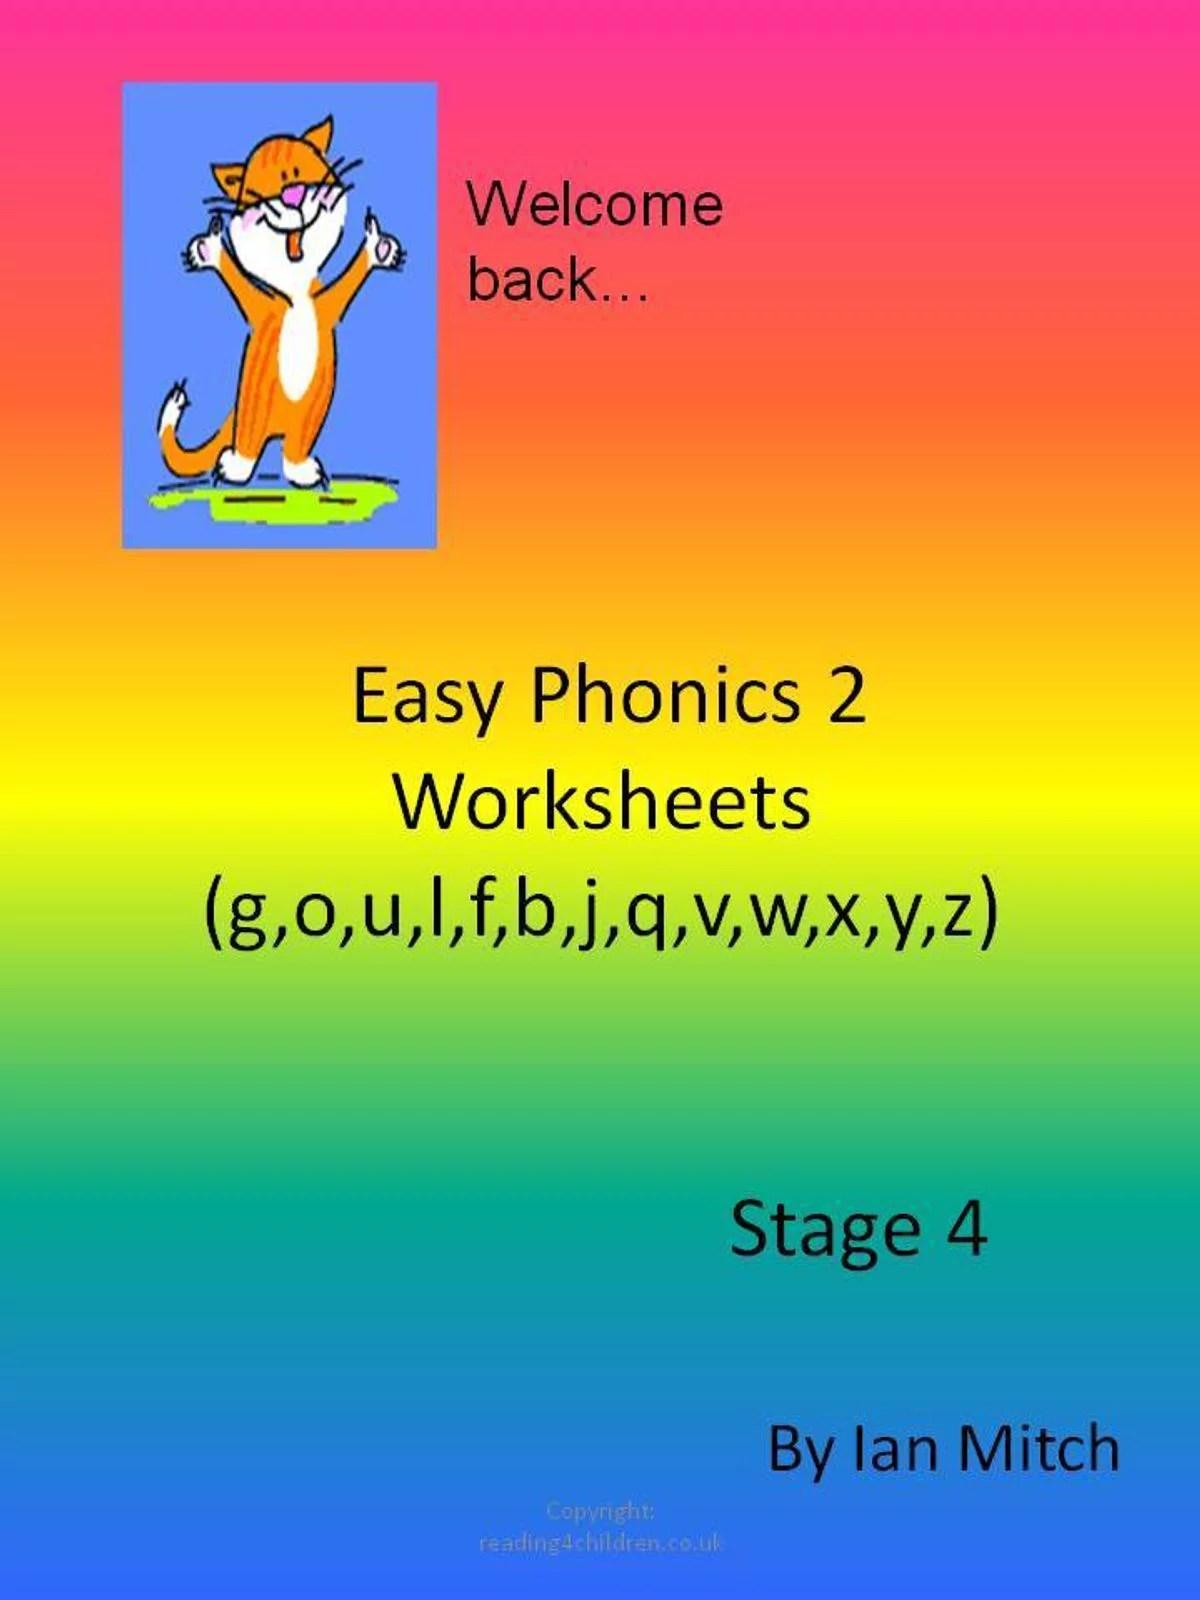 Easy Phonics 2 Worksheets G O U L F B J Q V W X Y Z